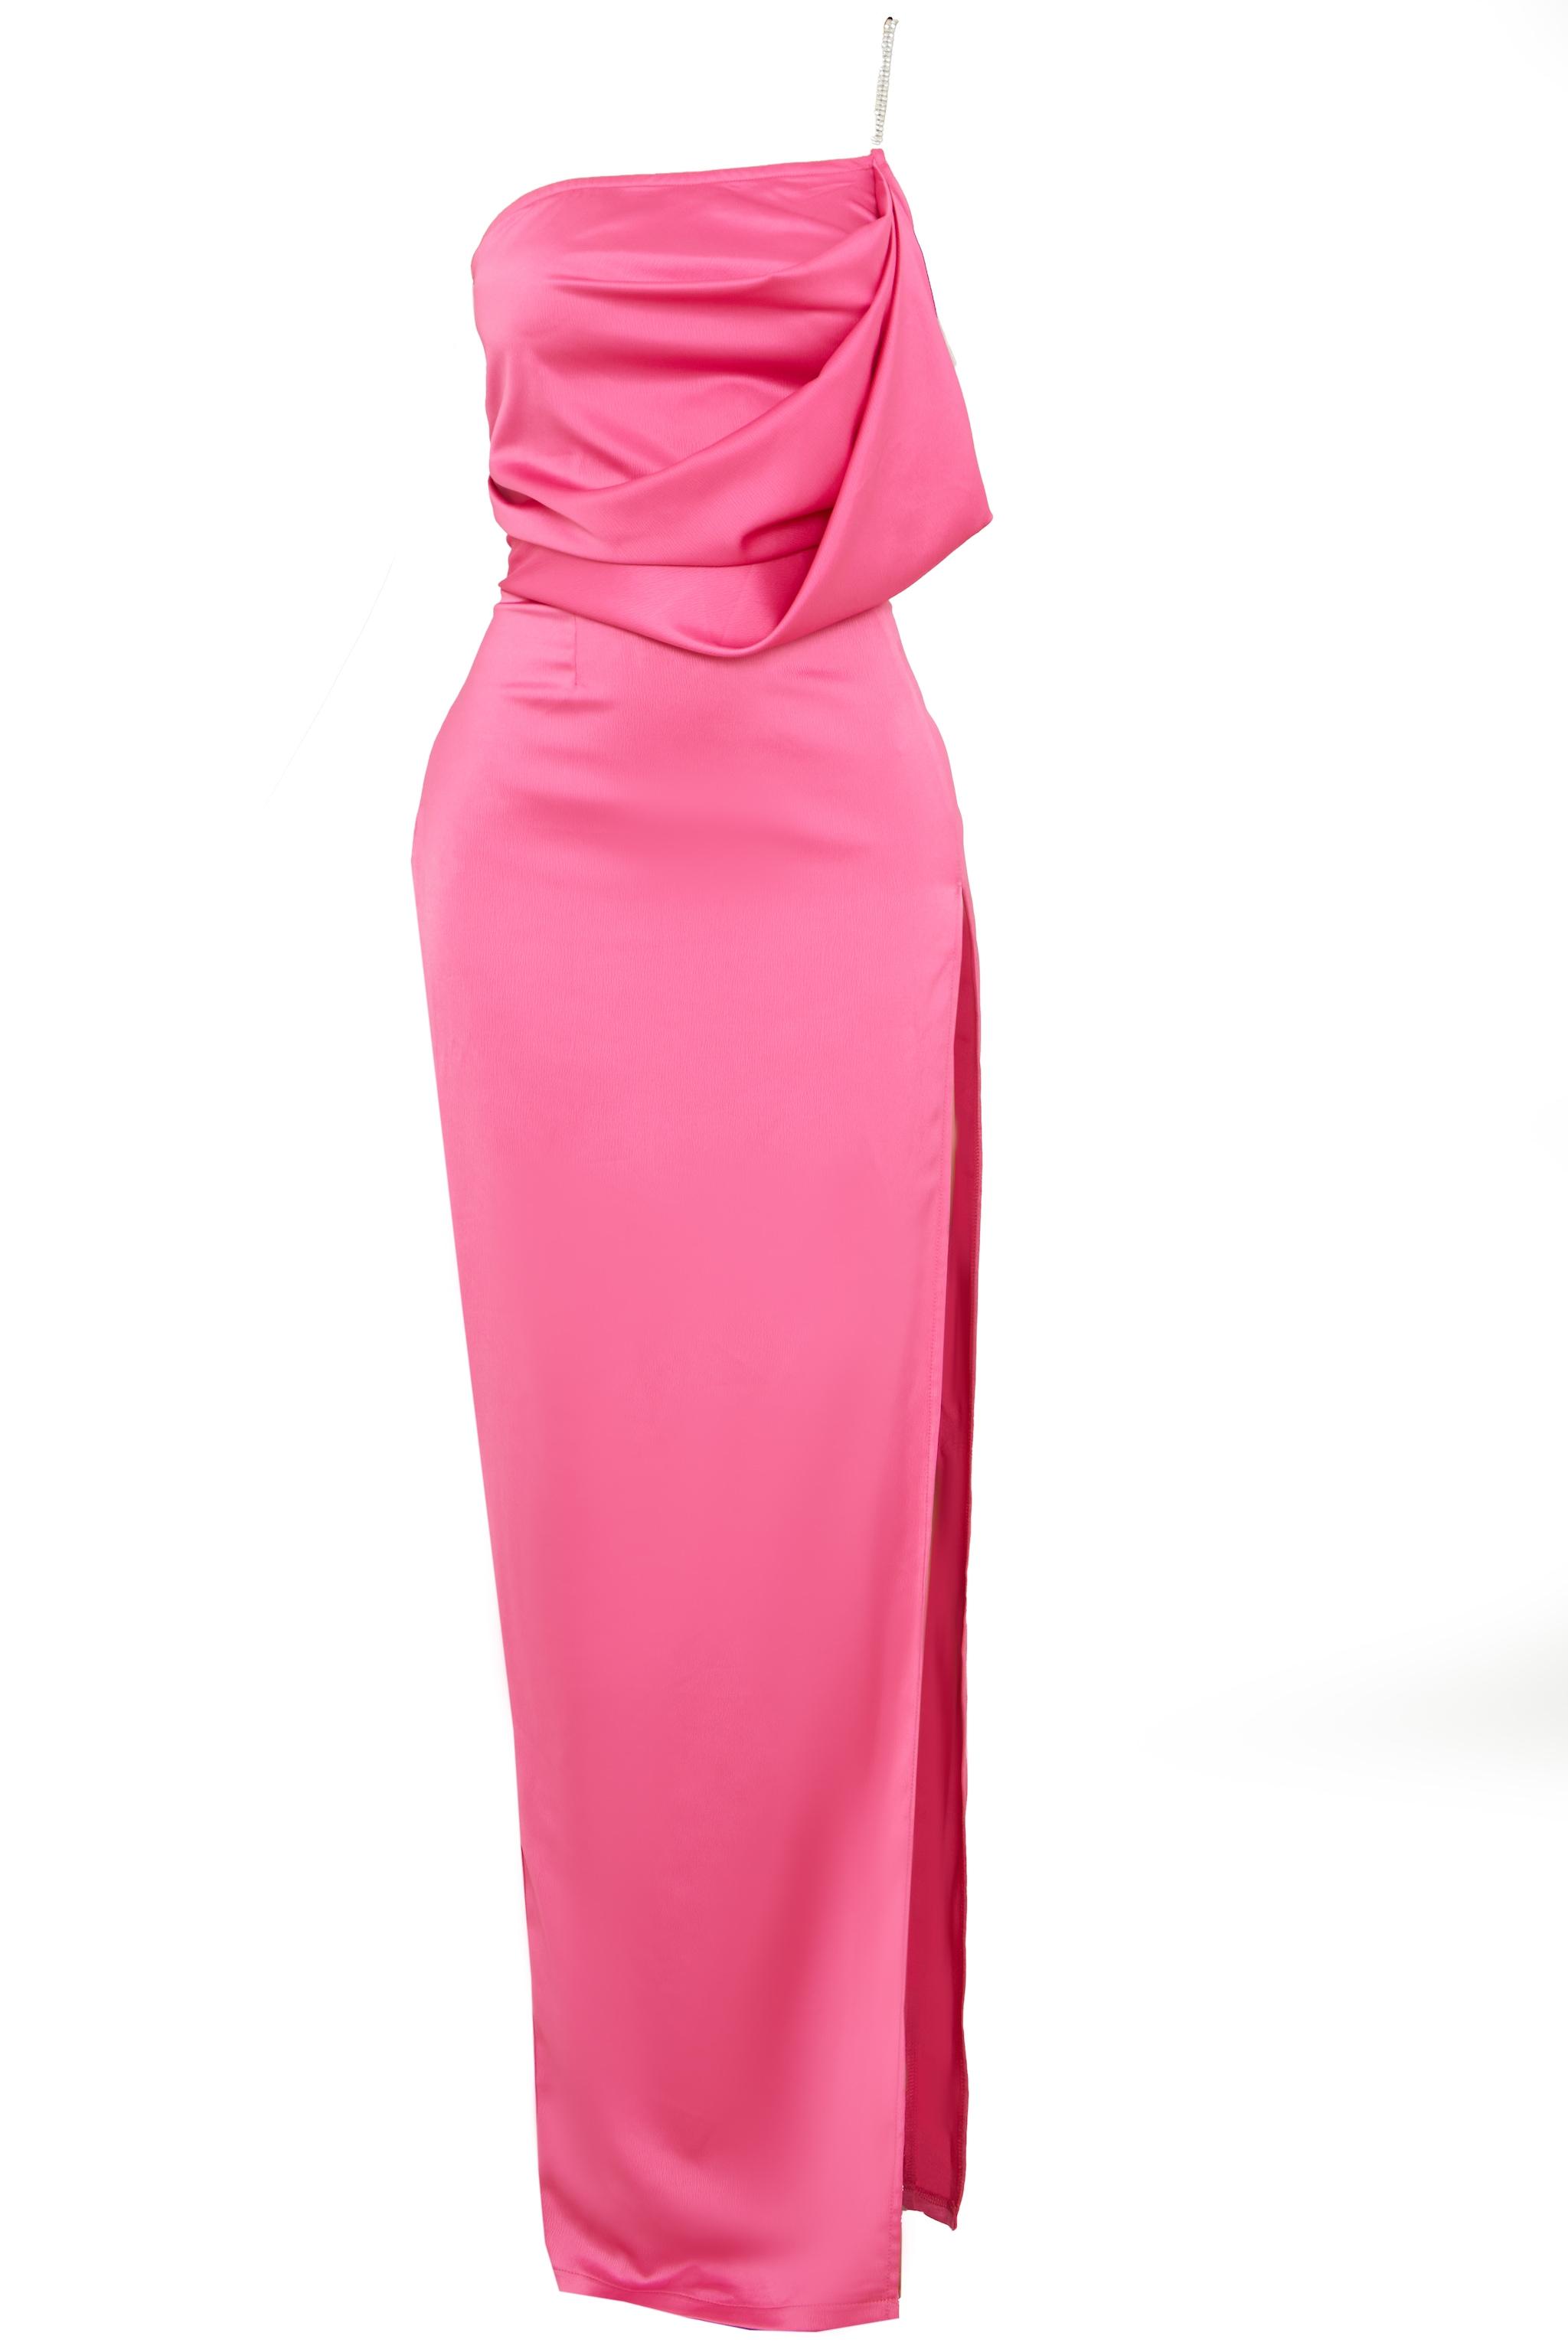 Hot Pink Satin Diamante One Shoulder Drape Maxi Dress 6